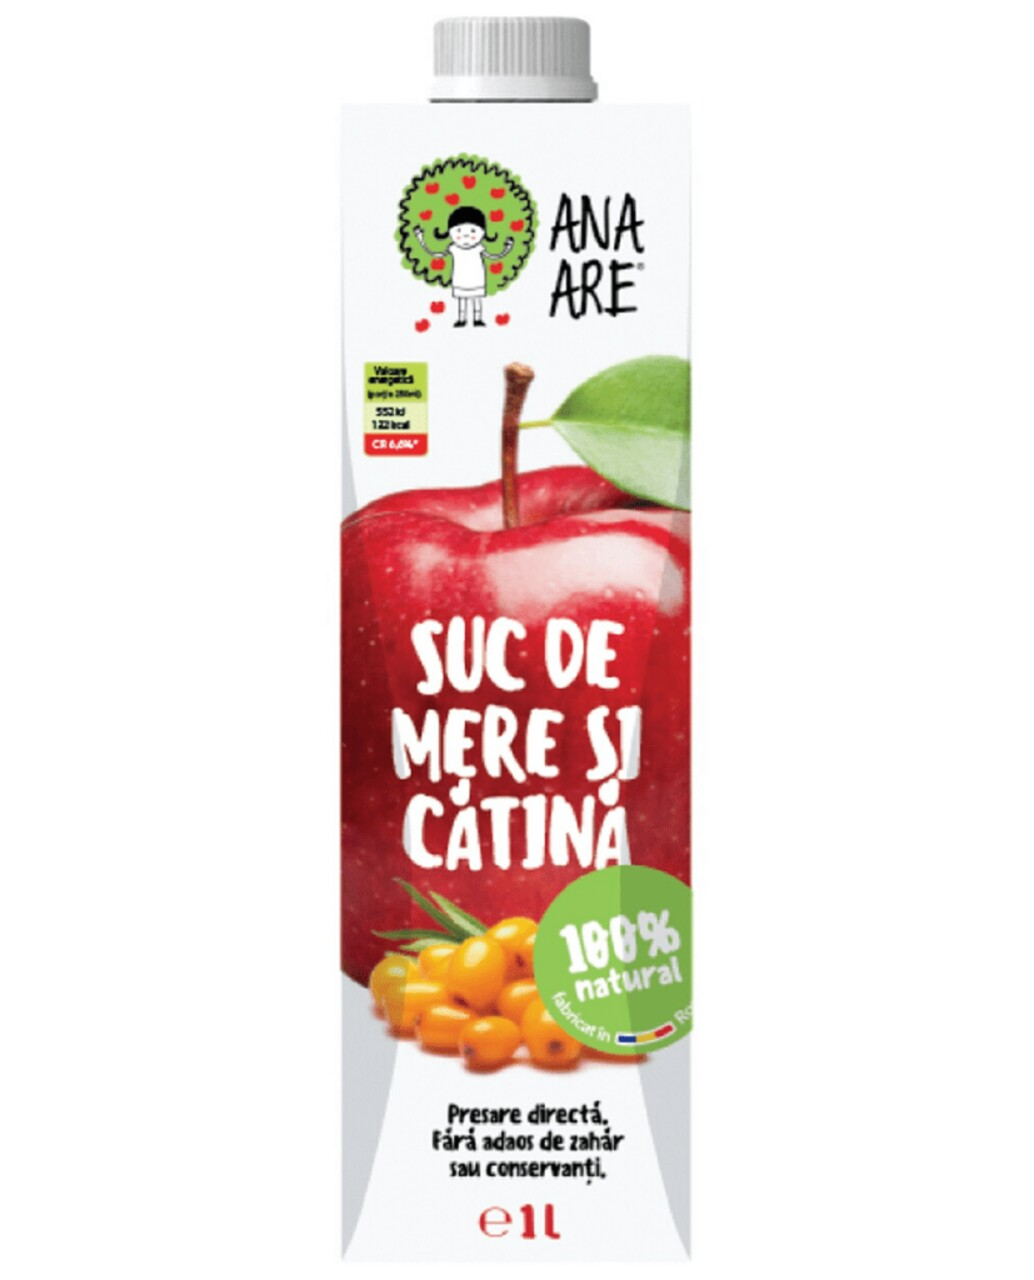 Suc de Mere & Catina 100% Natural Ana Are 12X 1L